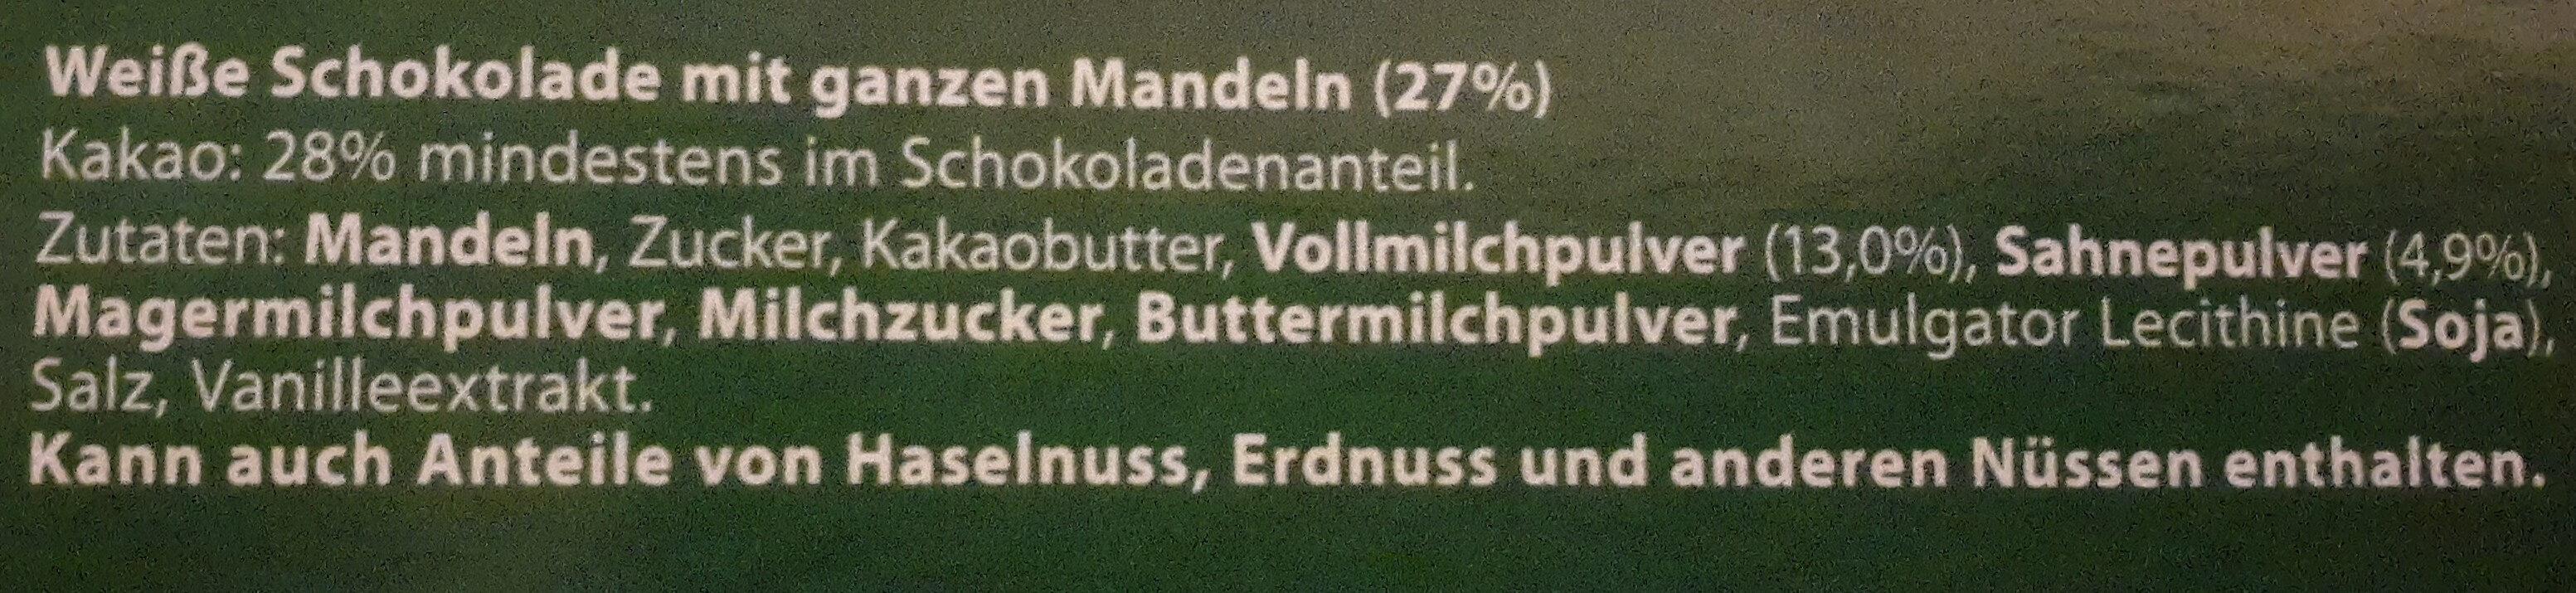 Choceur Weisse Mandel - Ingrédients - de